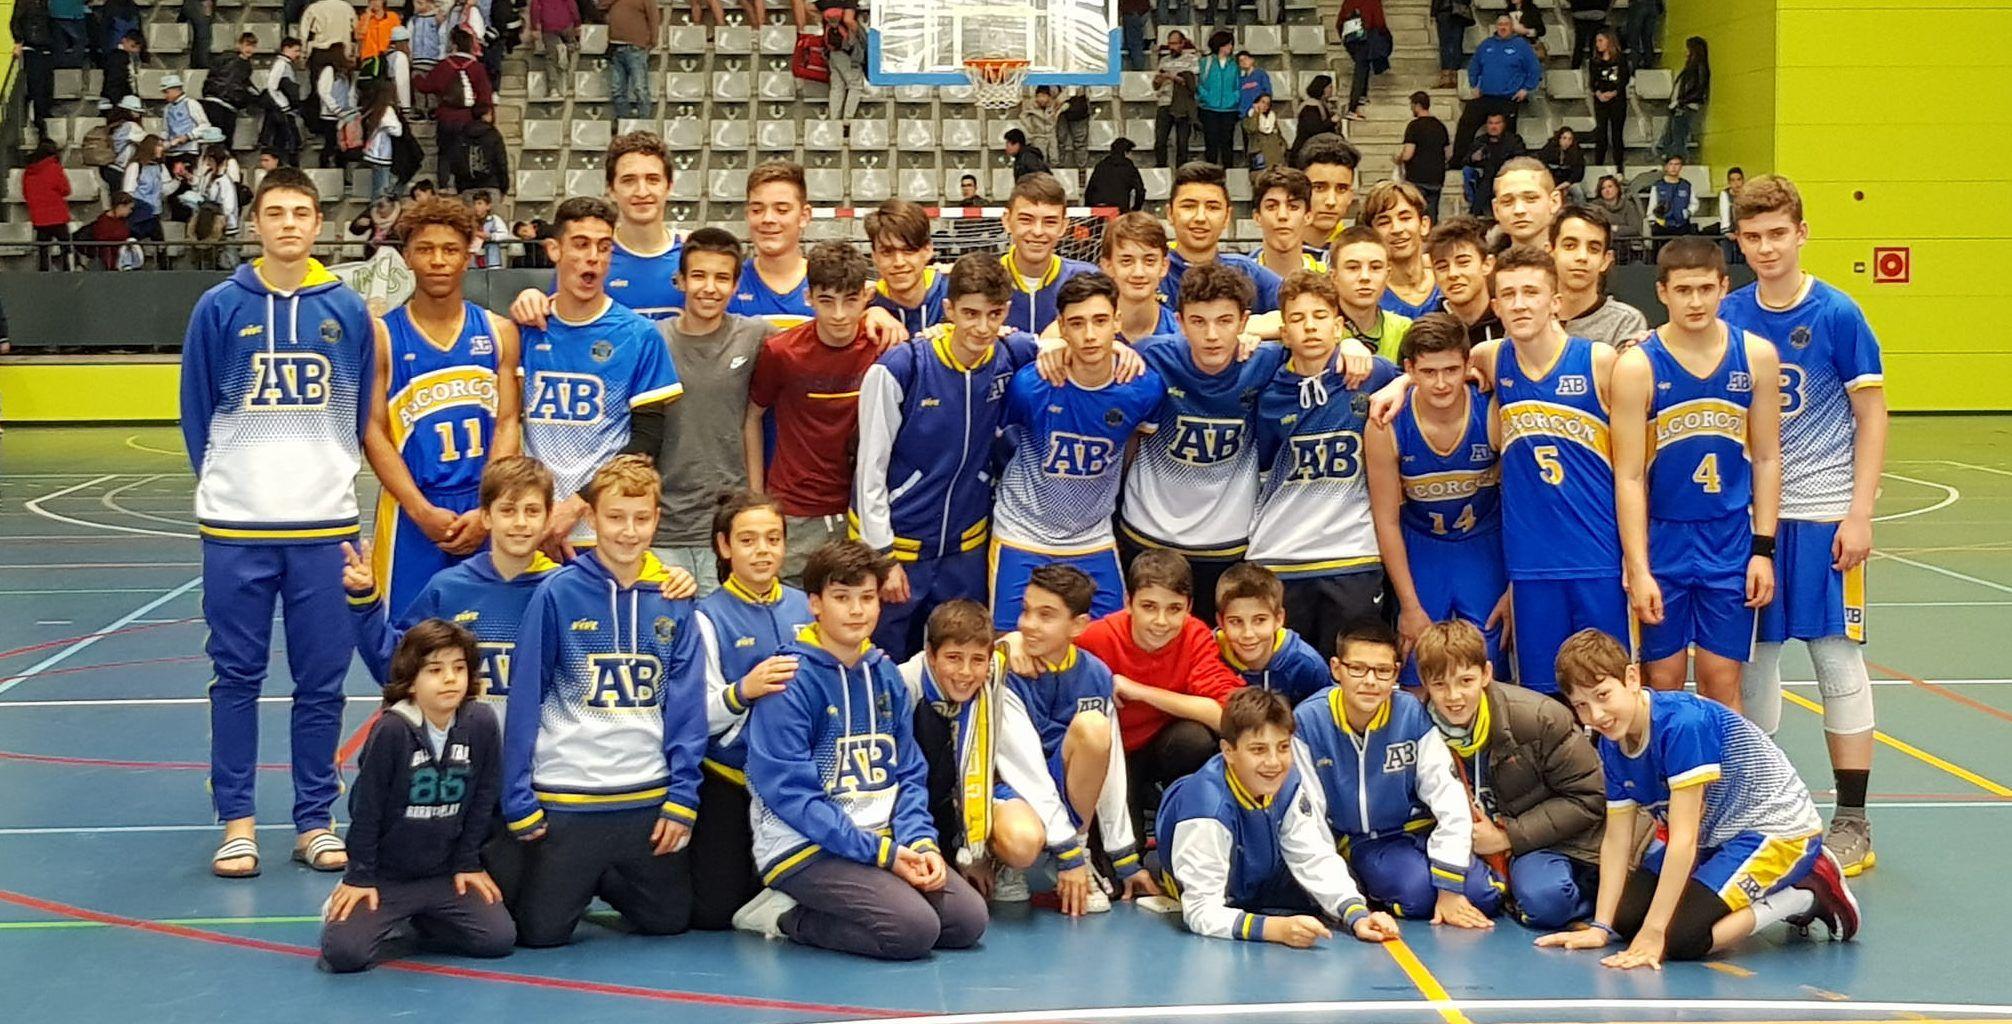 globasket 2018 alcorcon basket